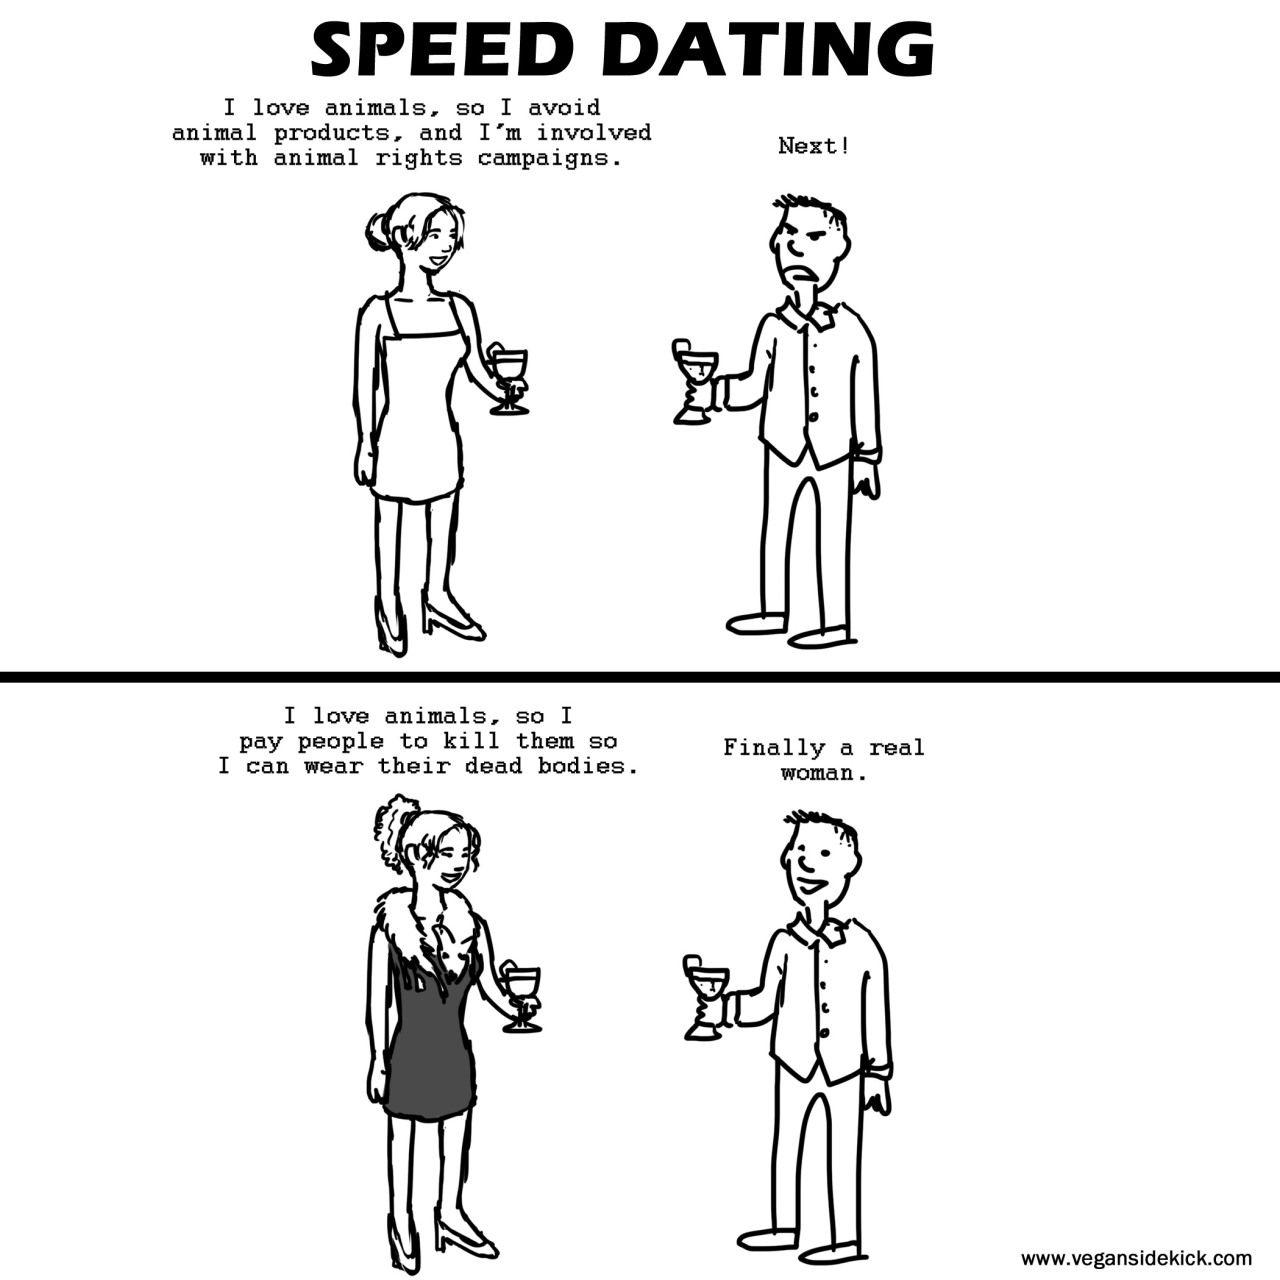 men dating younger women advice